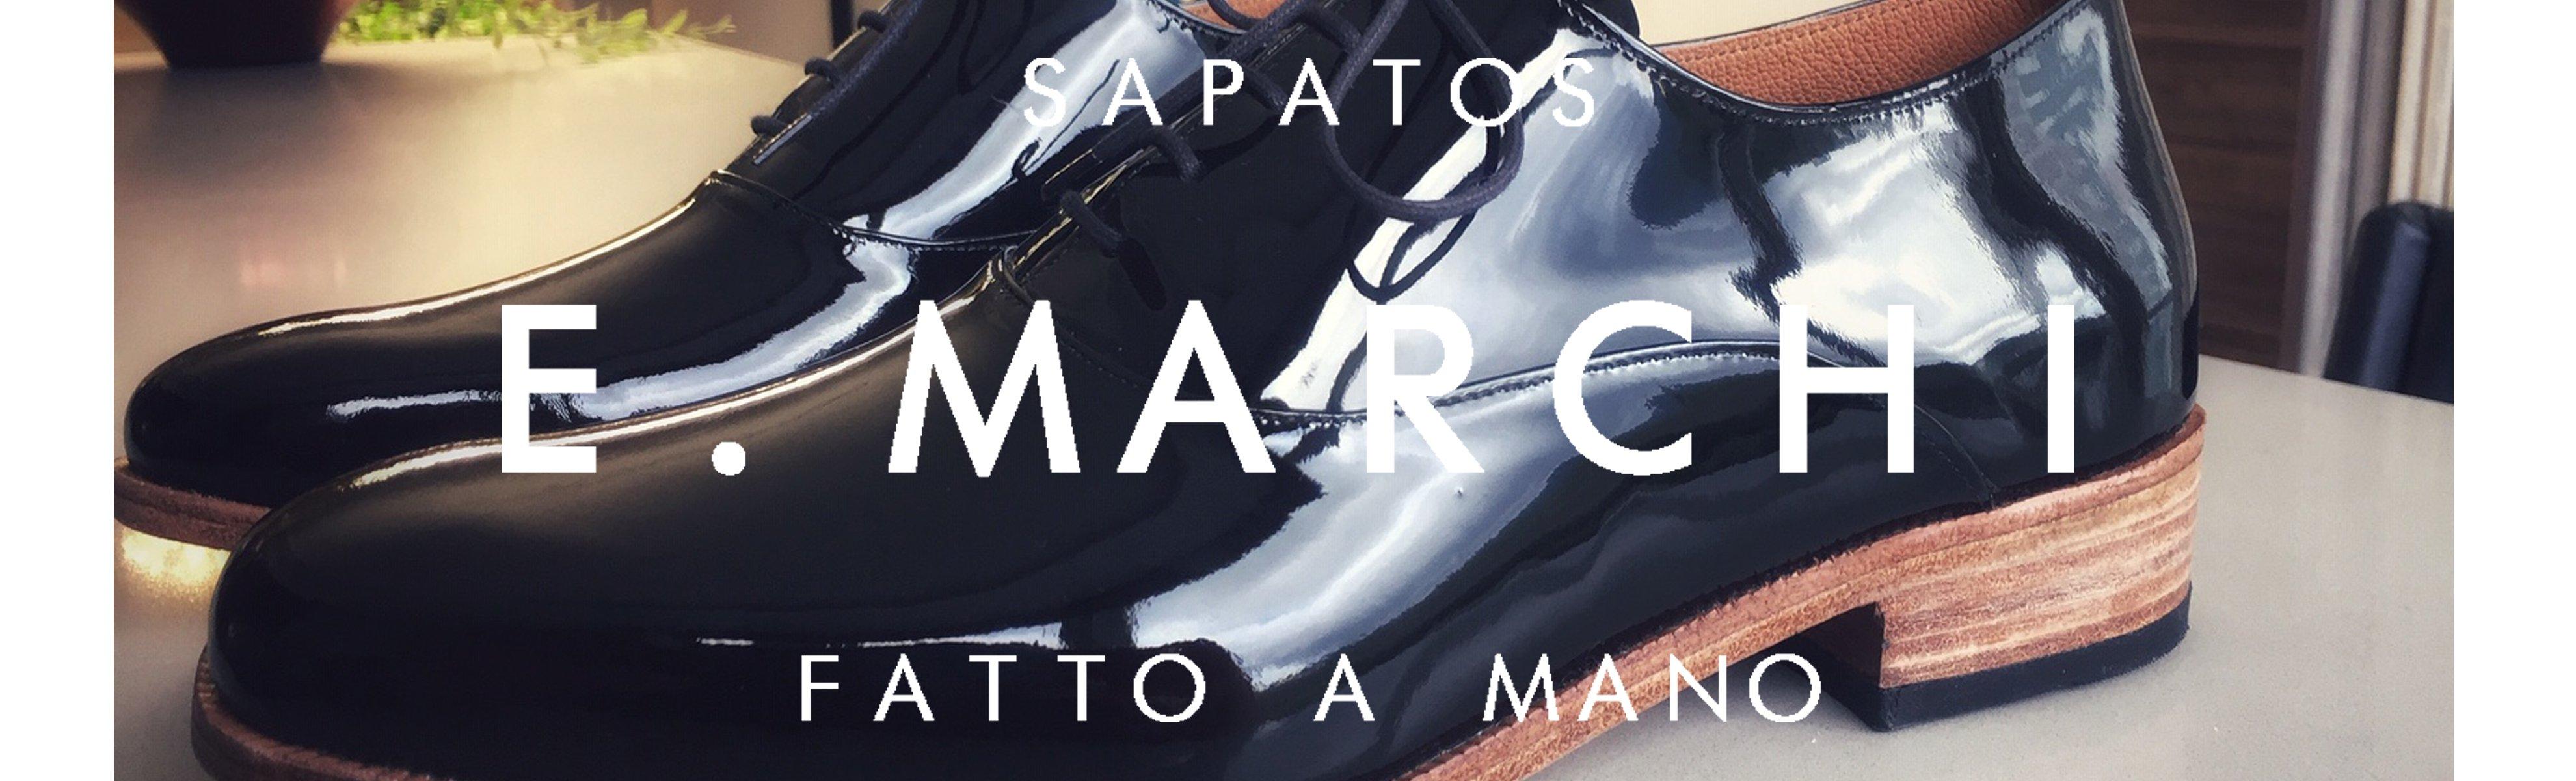 Sapato masculino Oxford Leonardo verniz preto